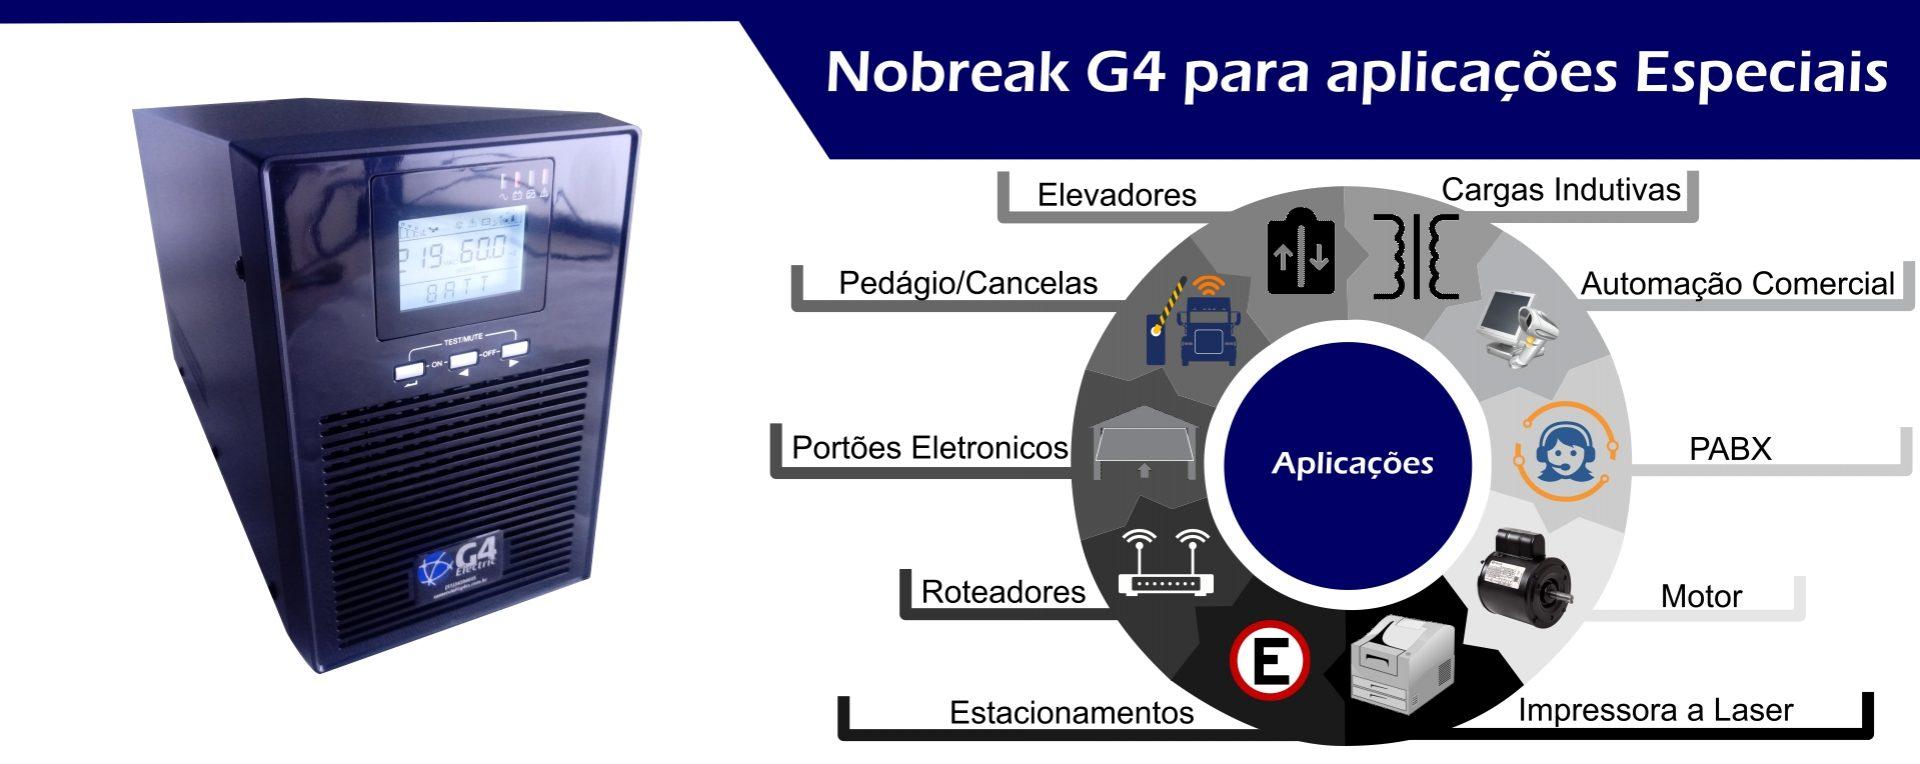 Nobreak G4 Electric Interativo Senoidal Puro Família Ess-400n